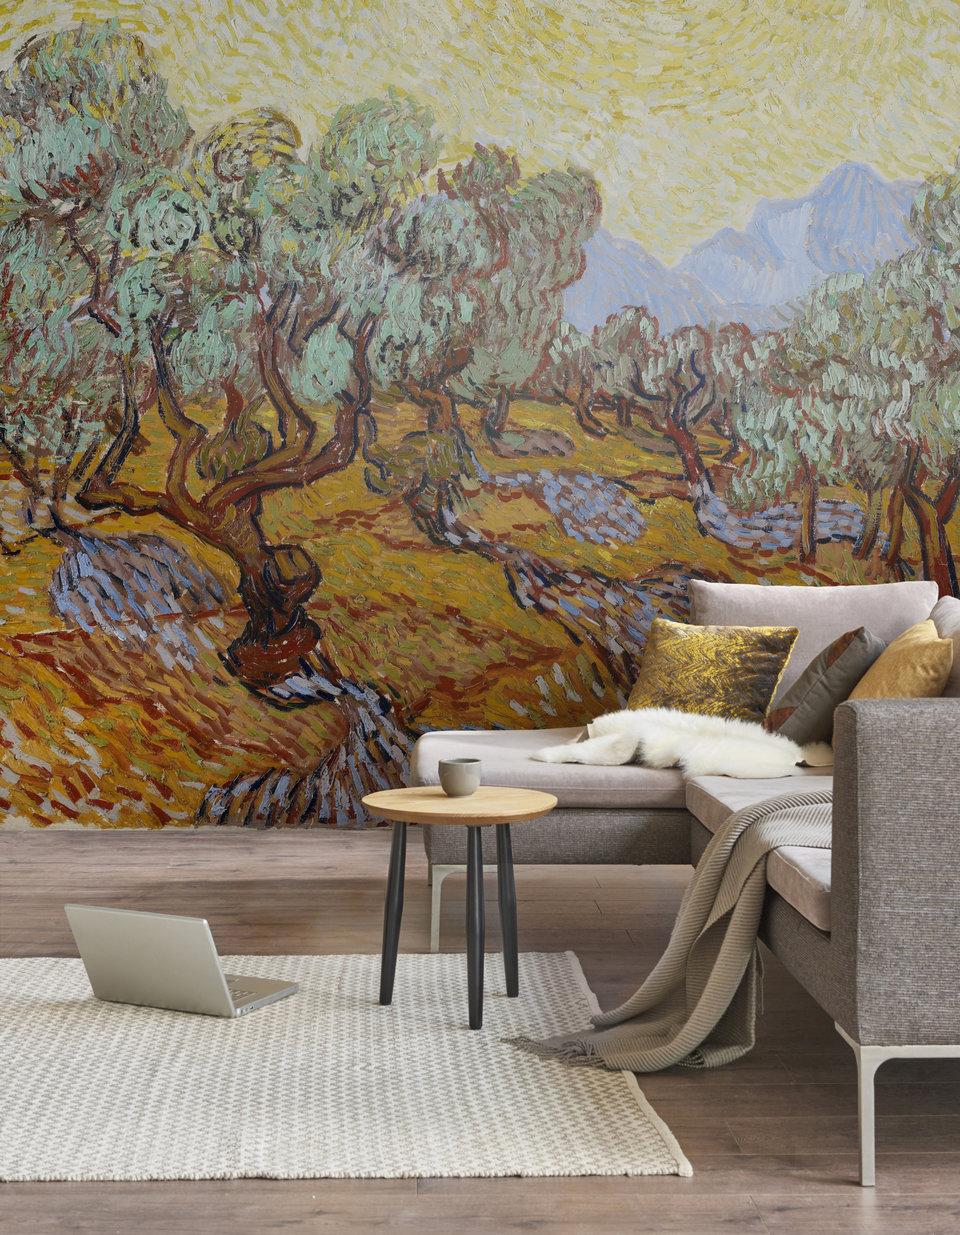 Vincent Van Gogh, Olive garden